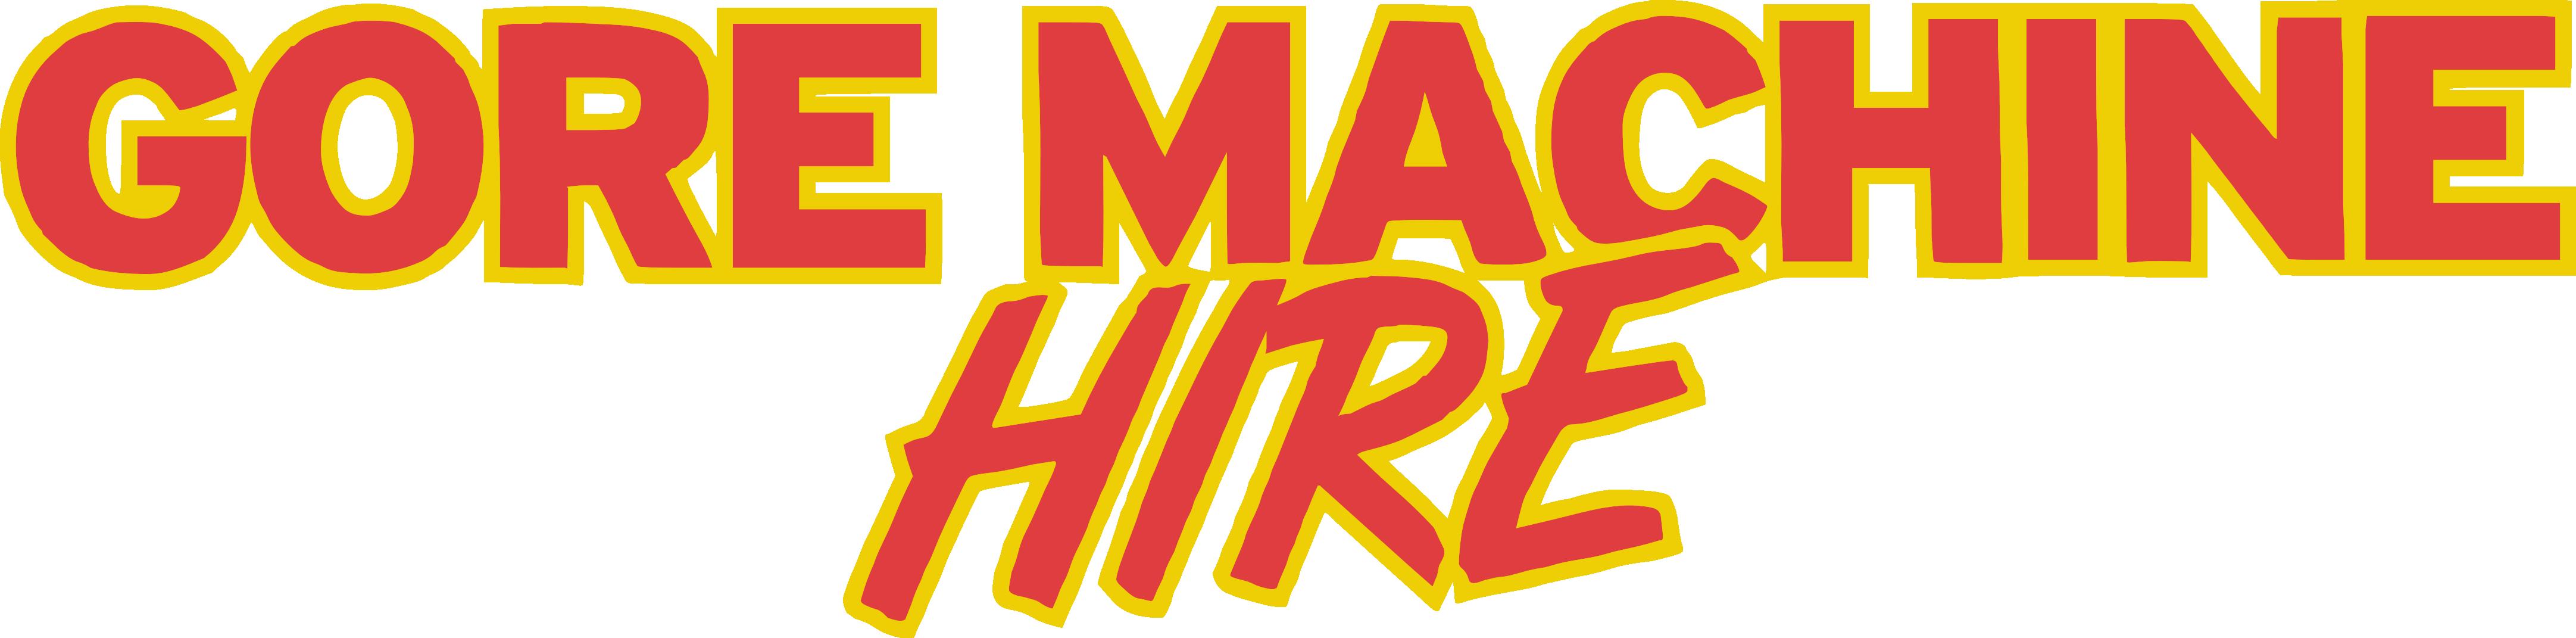 Gore Machine Hire